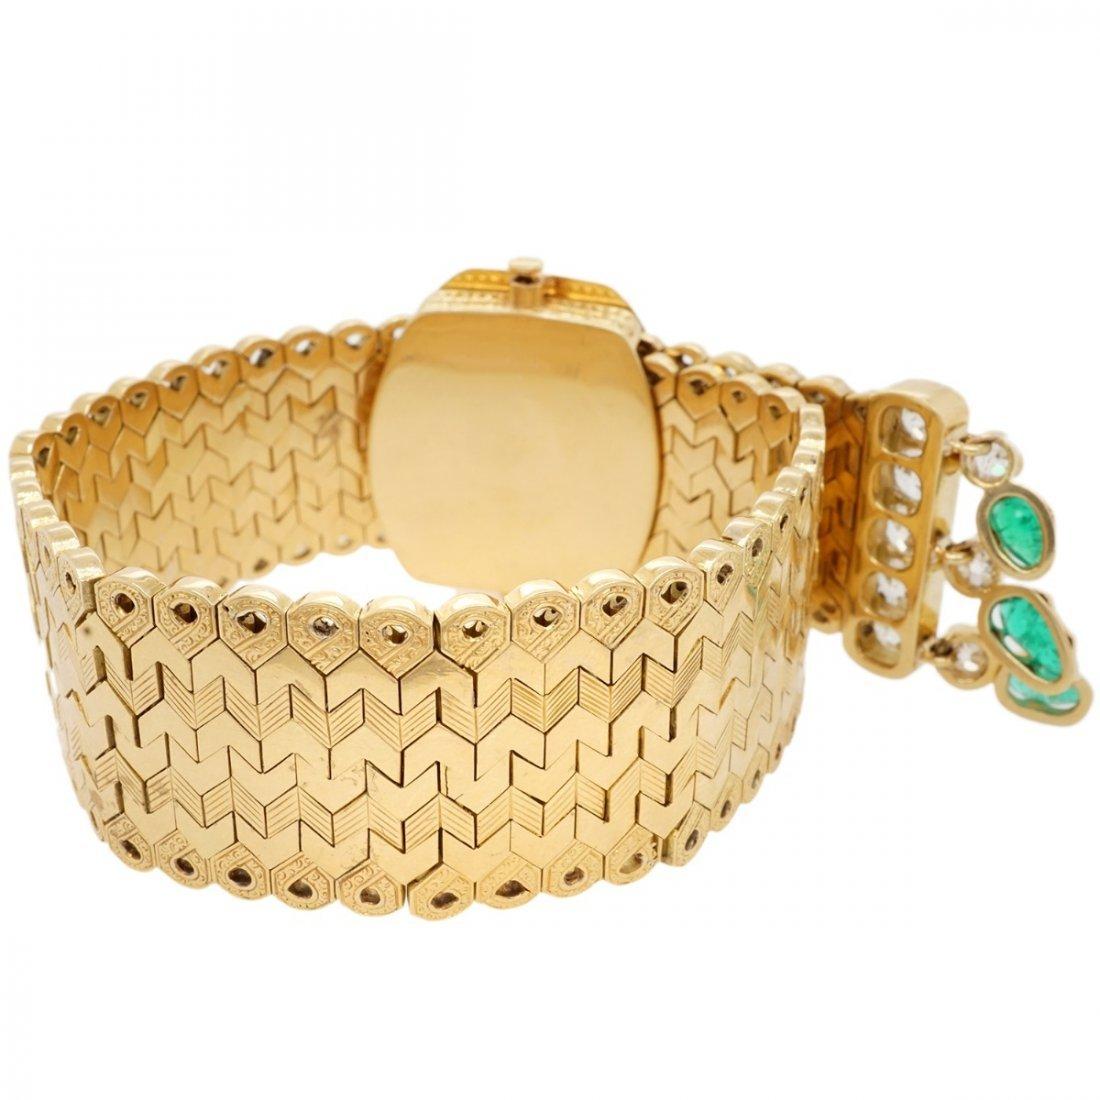 FRENCH EMERALD DIAMOND 18 KARAT GOLD BRACELET - 7